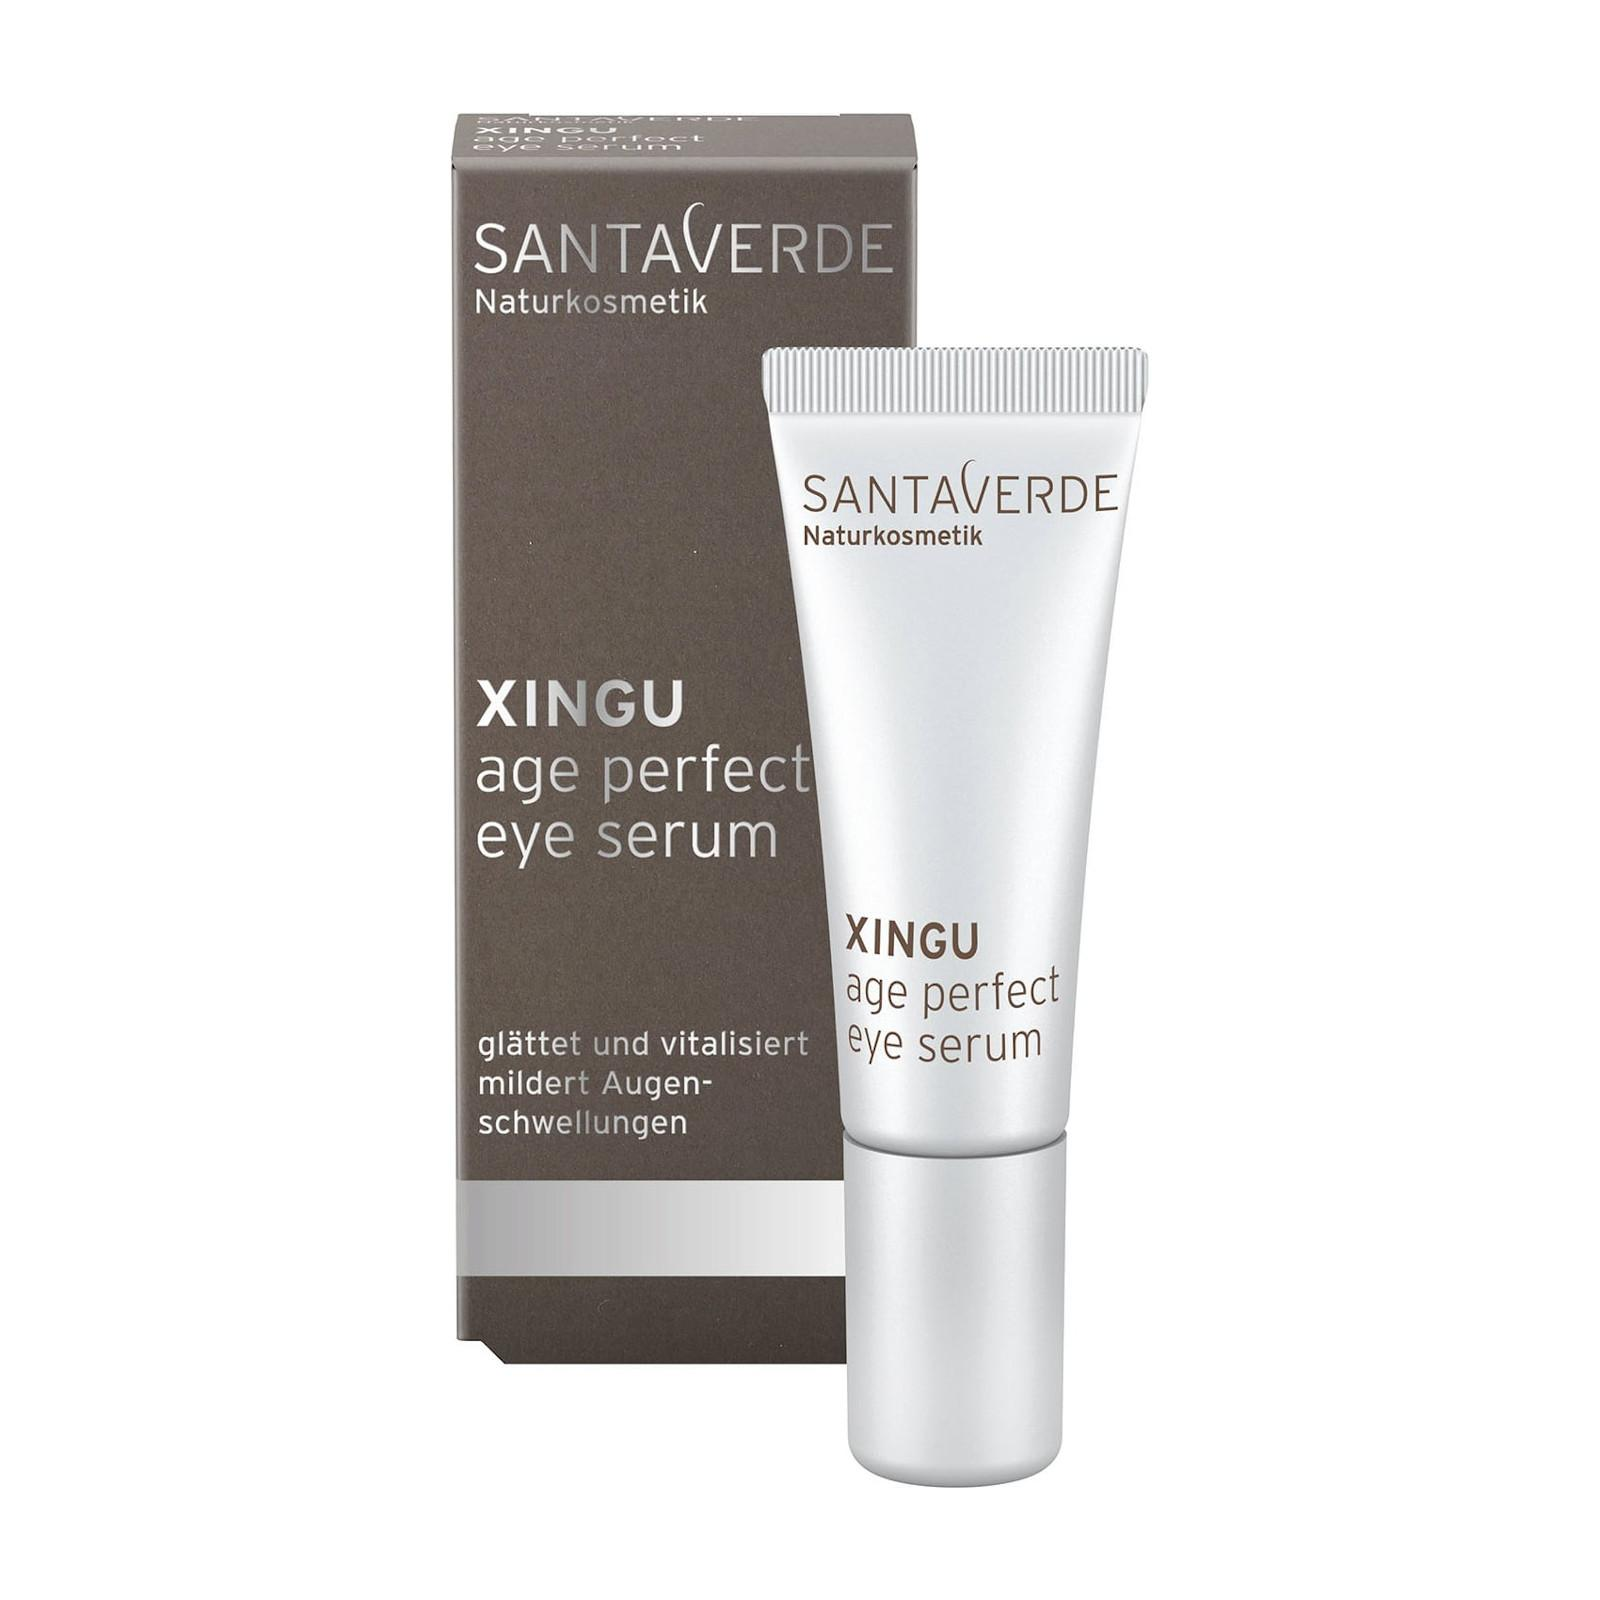 Santaverde Xingu Age perfect oční sérum 10 ml